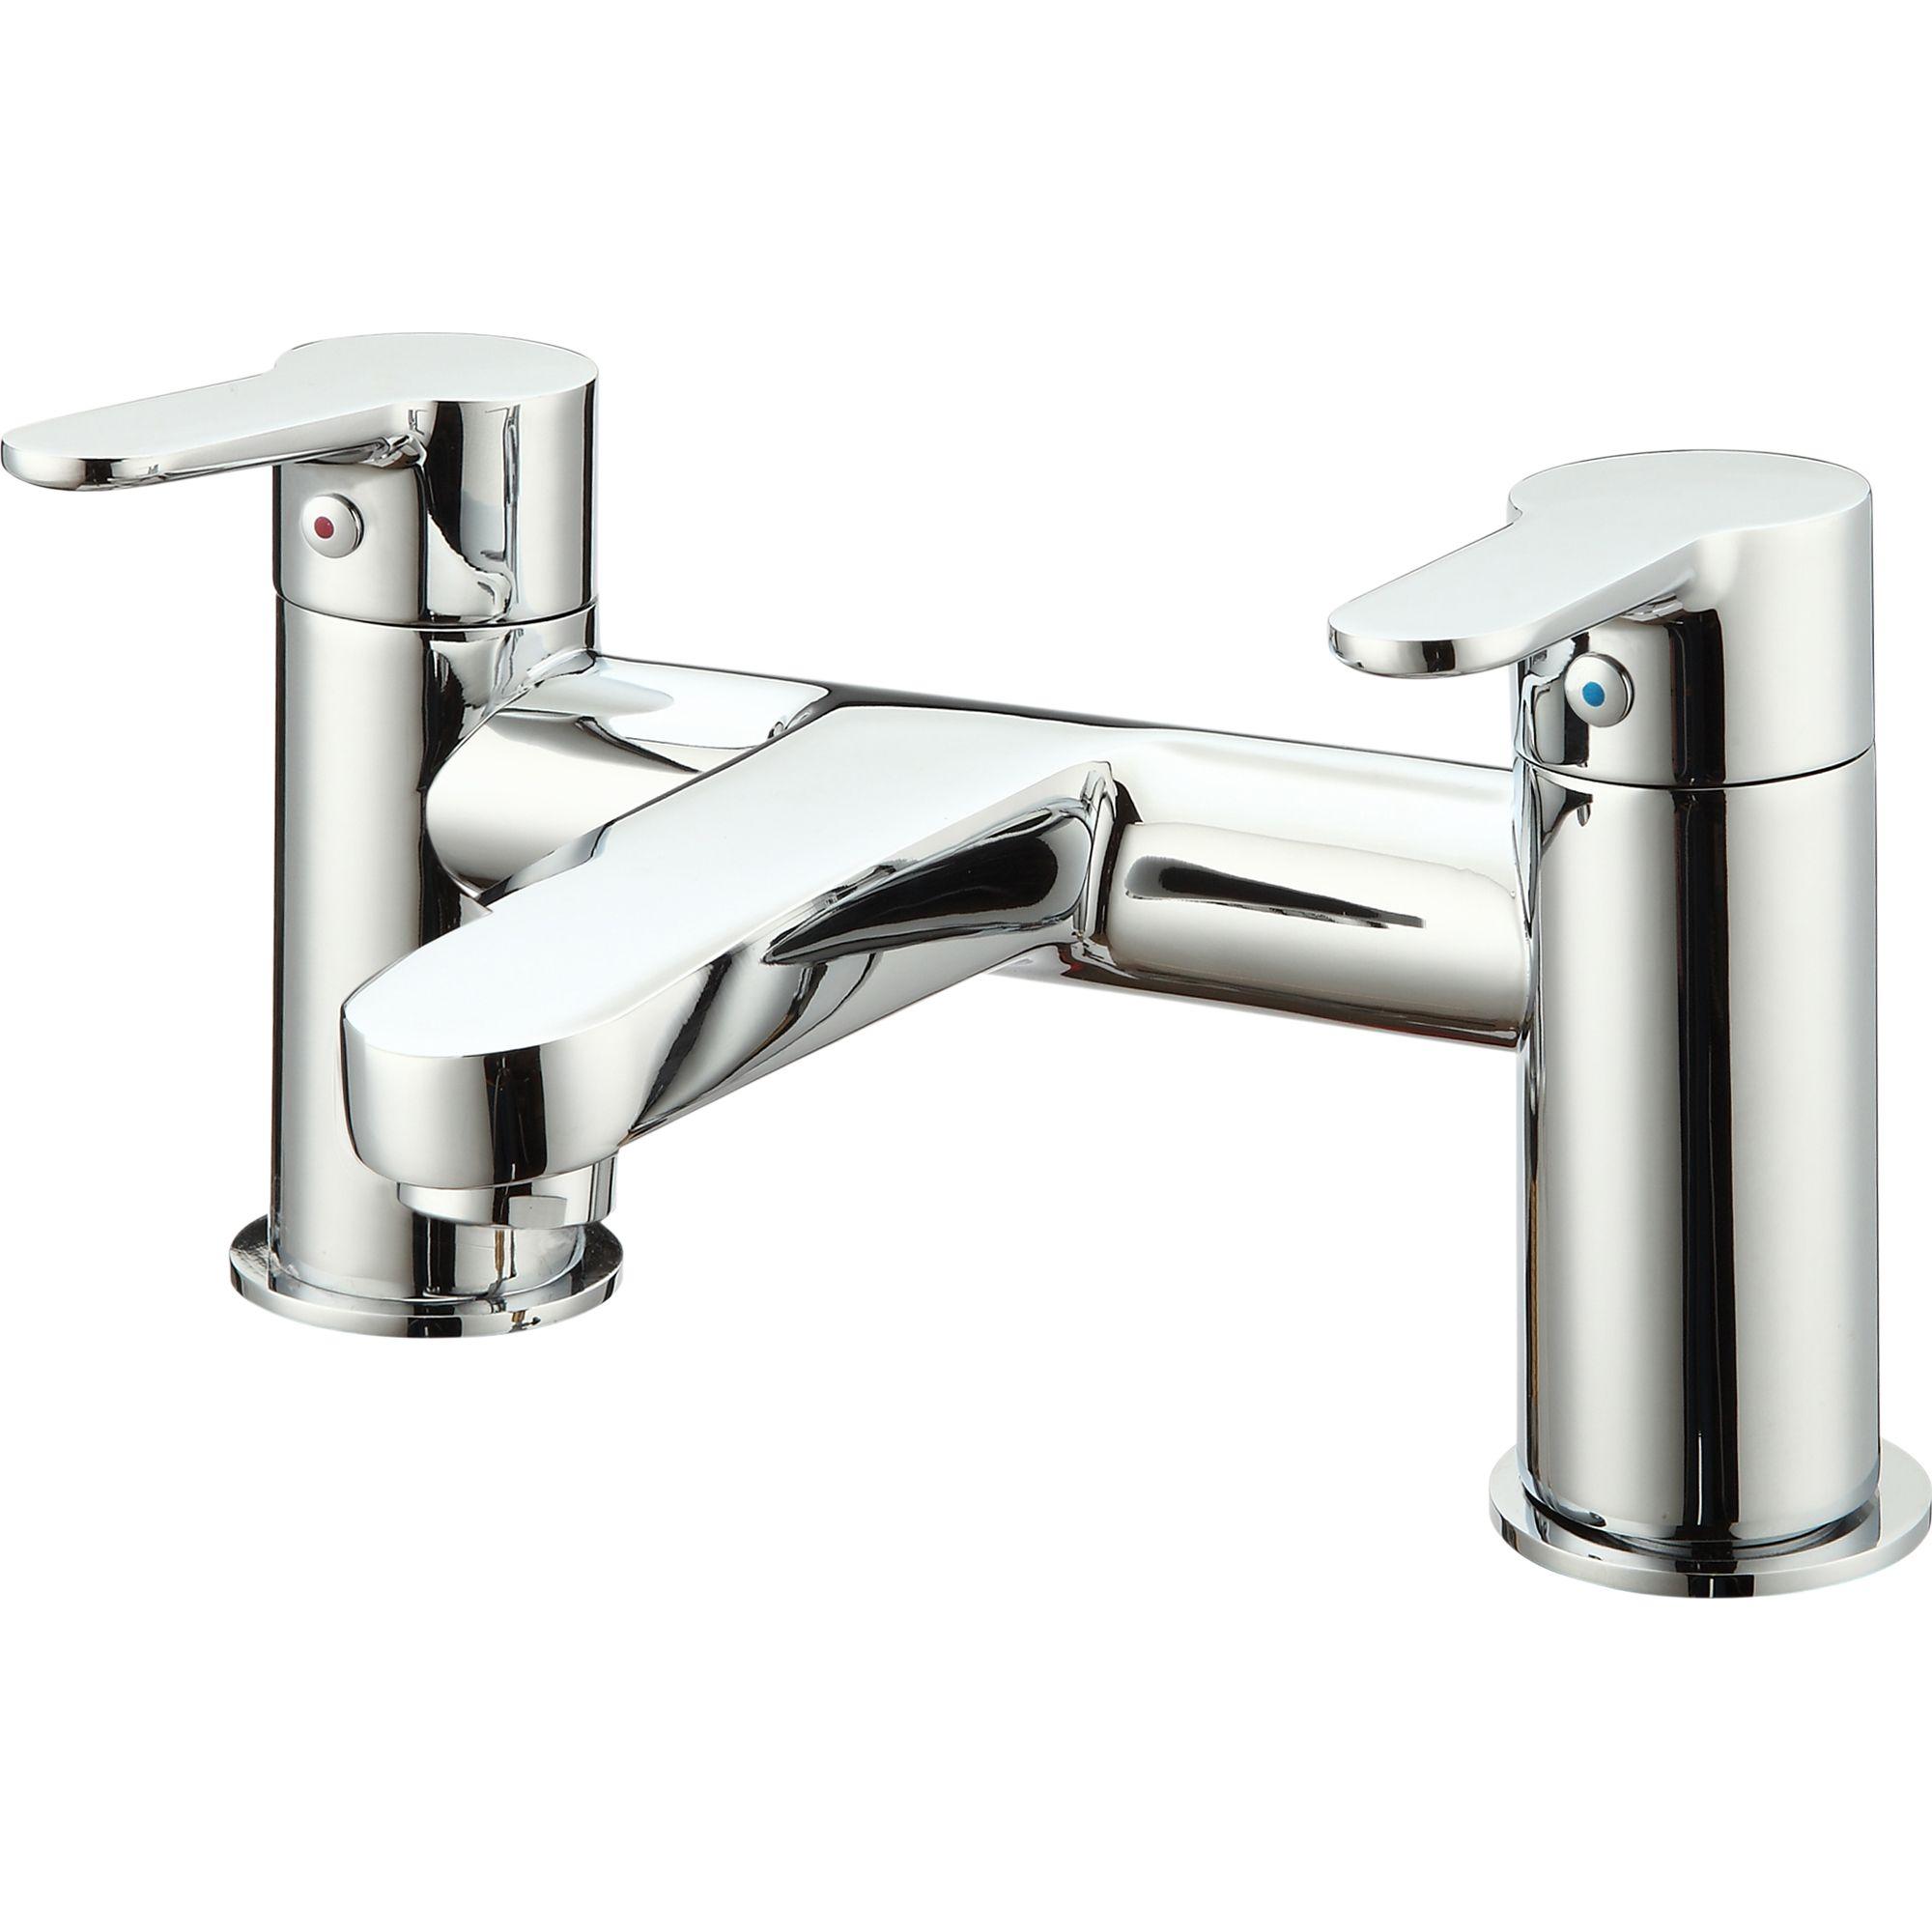 cooke lewis lecci chrome plated bath mixer tap. Black Bedroom Furniture Sets. Home Design Ideas